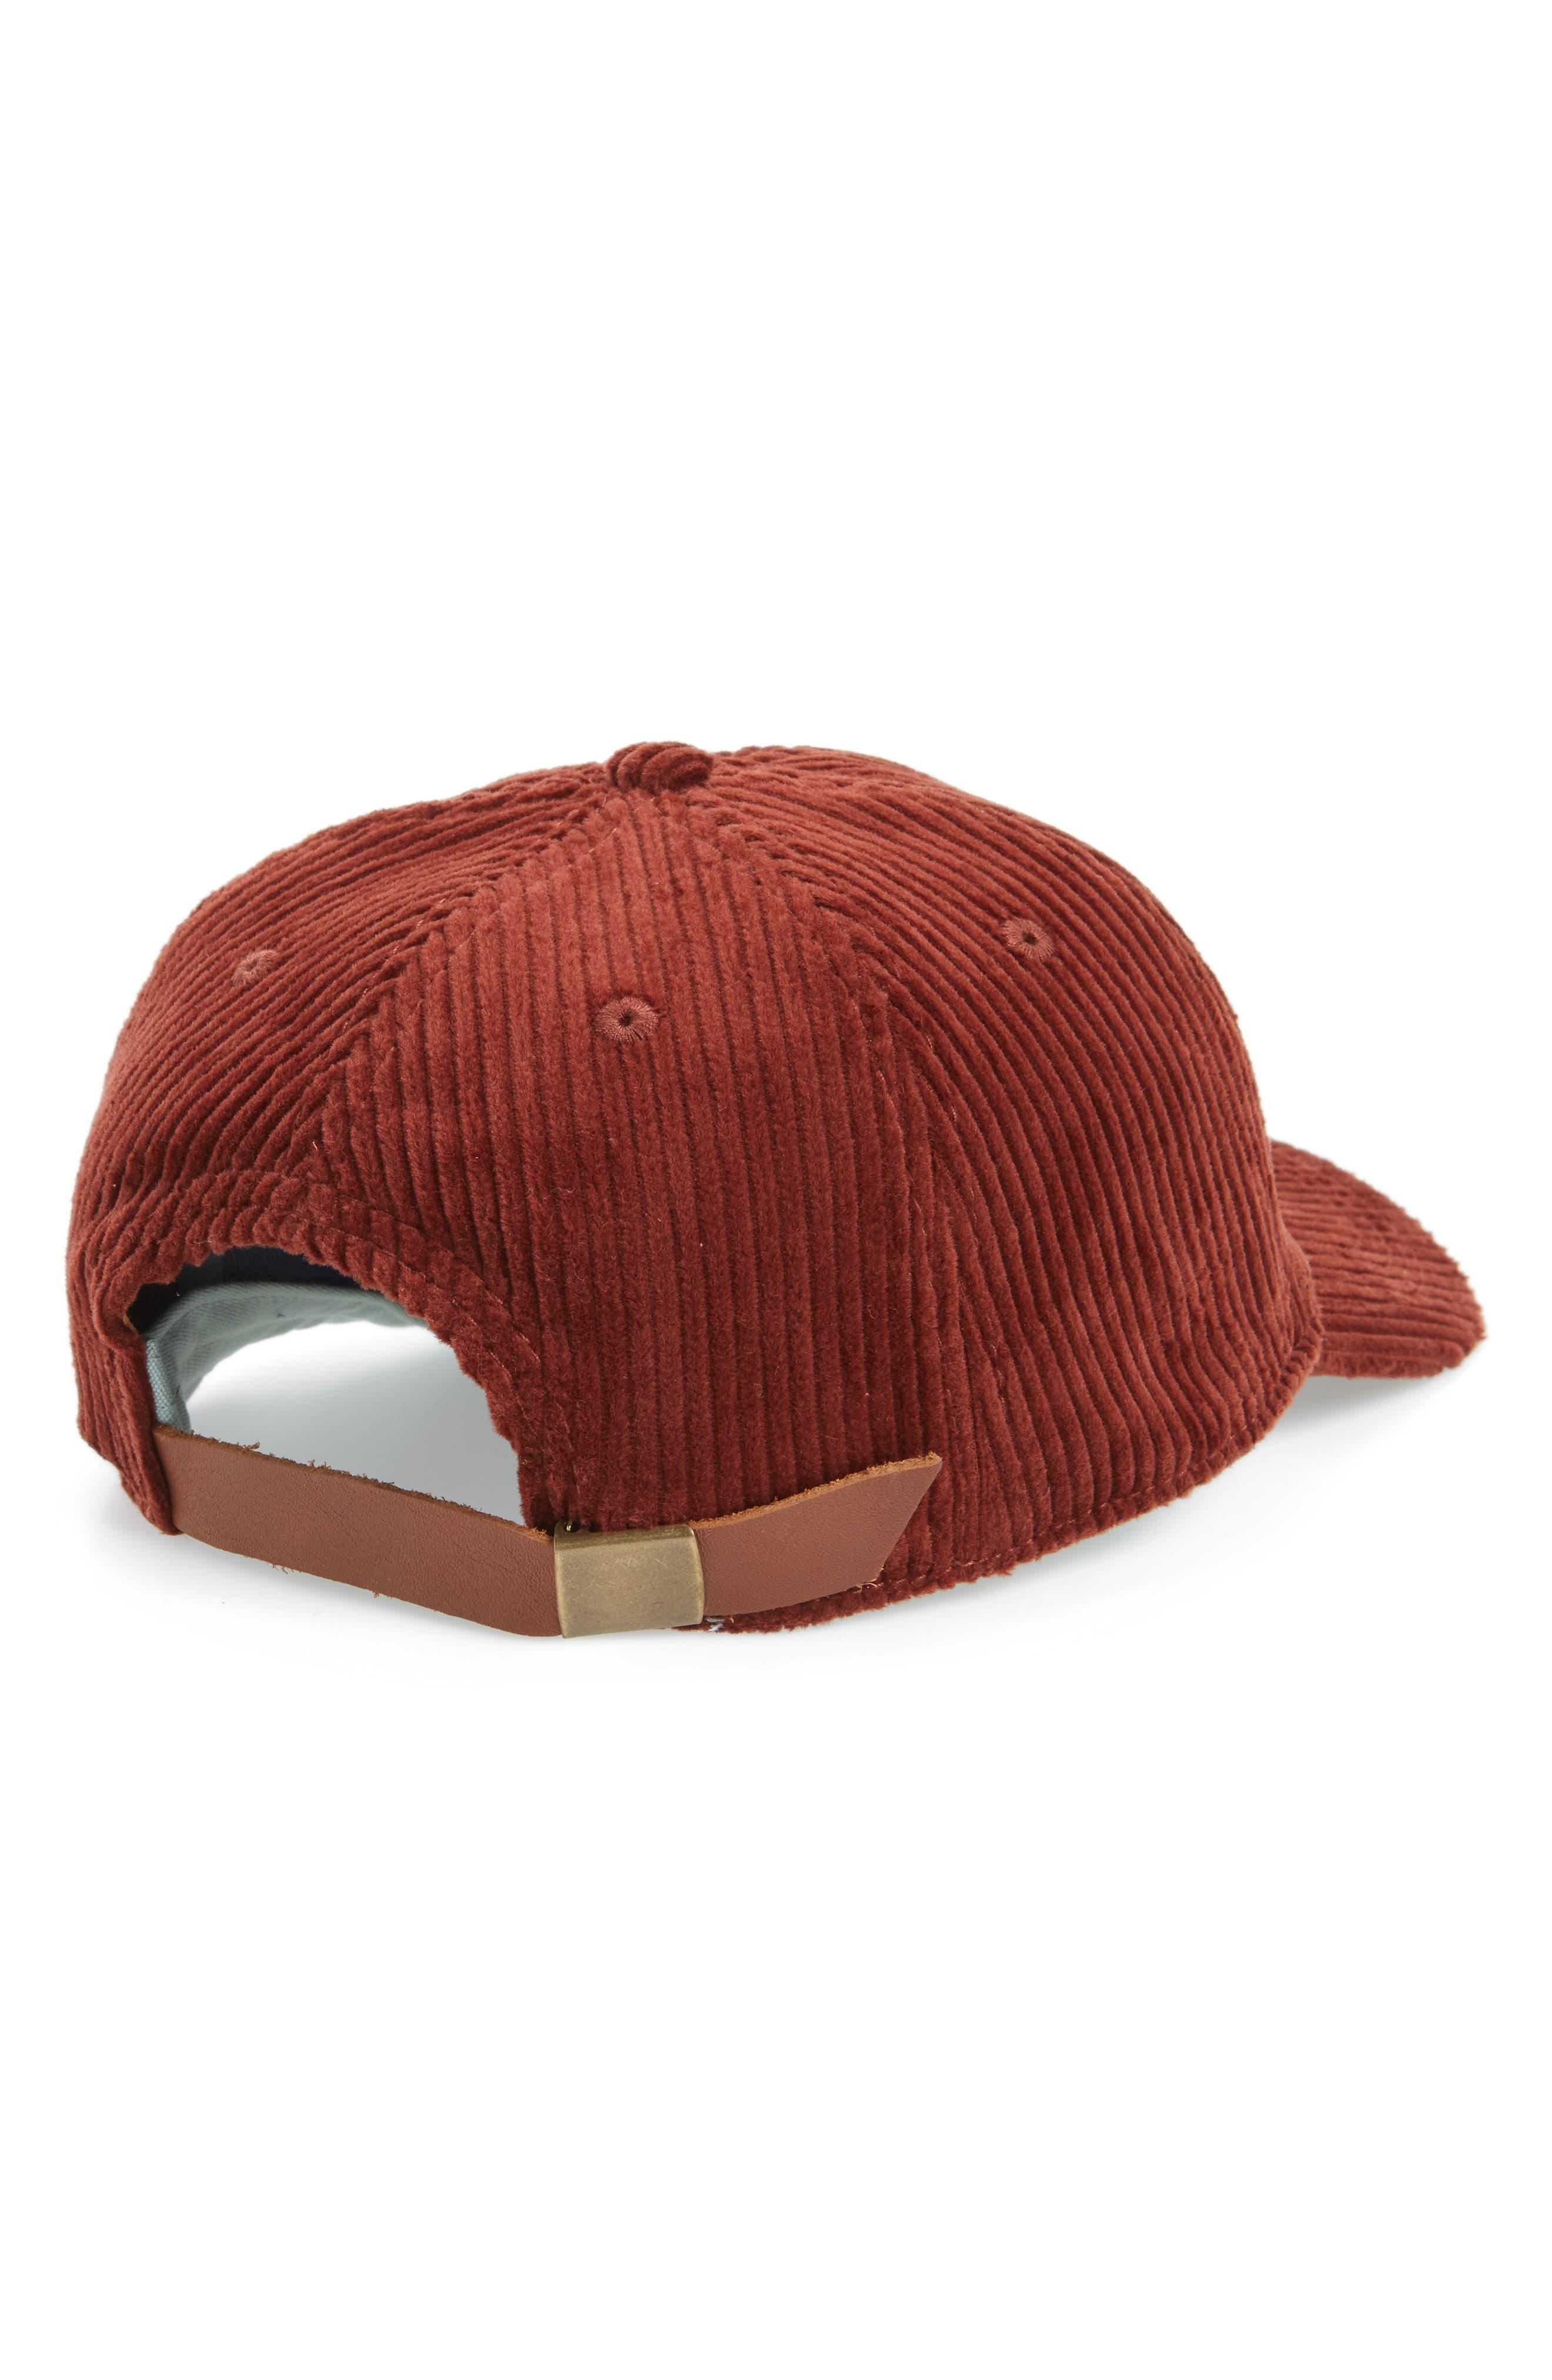 Corduroy Baseball Cap,                             Alternate thumbnail 2, color,                             Burnished Mahogany